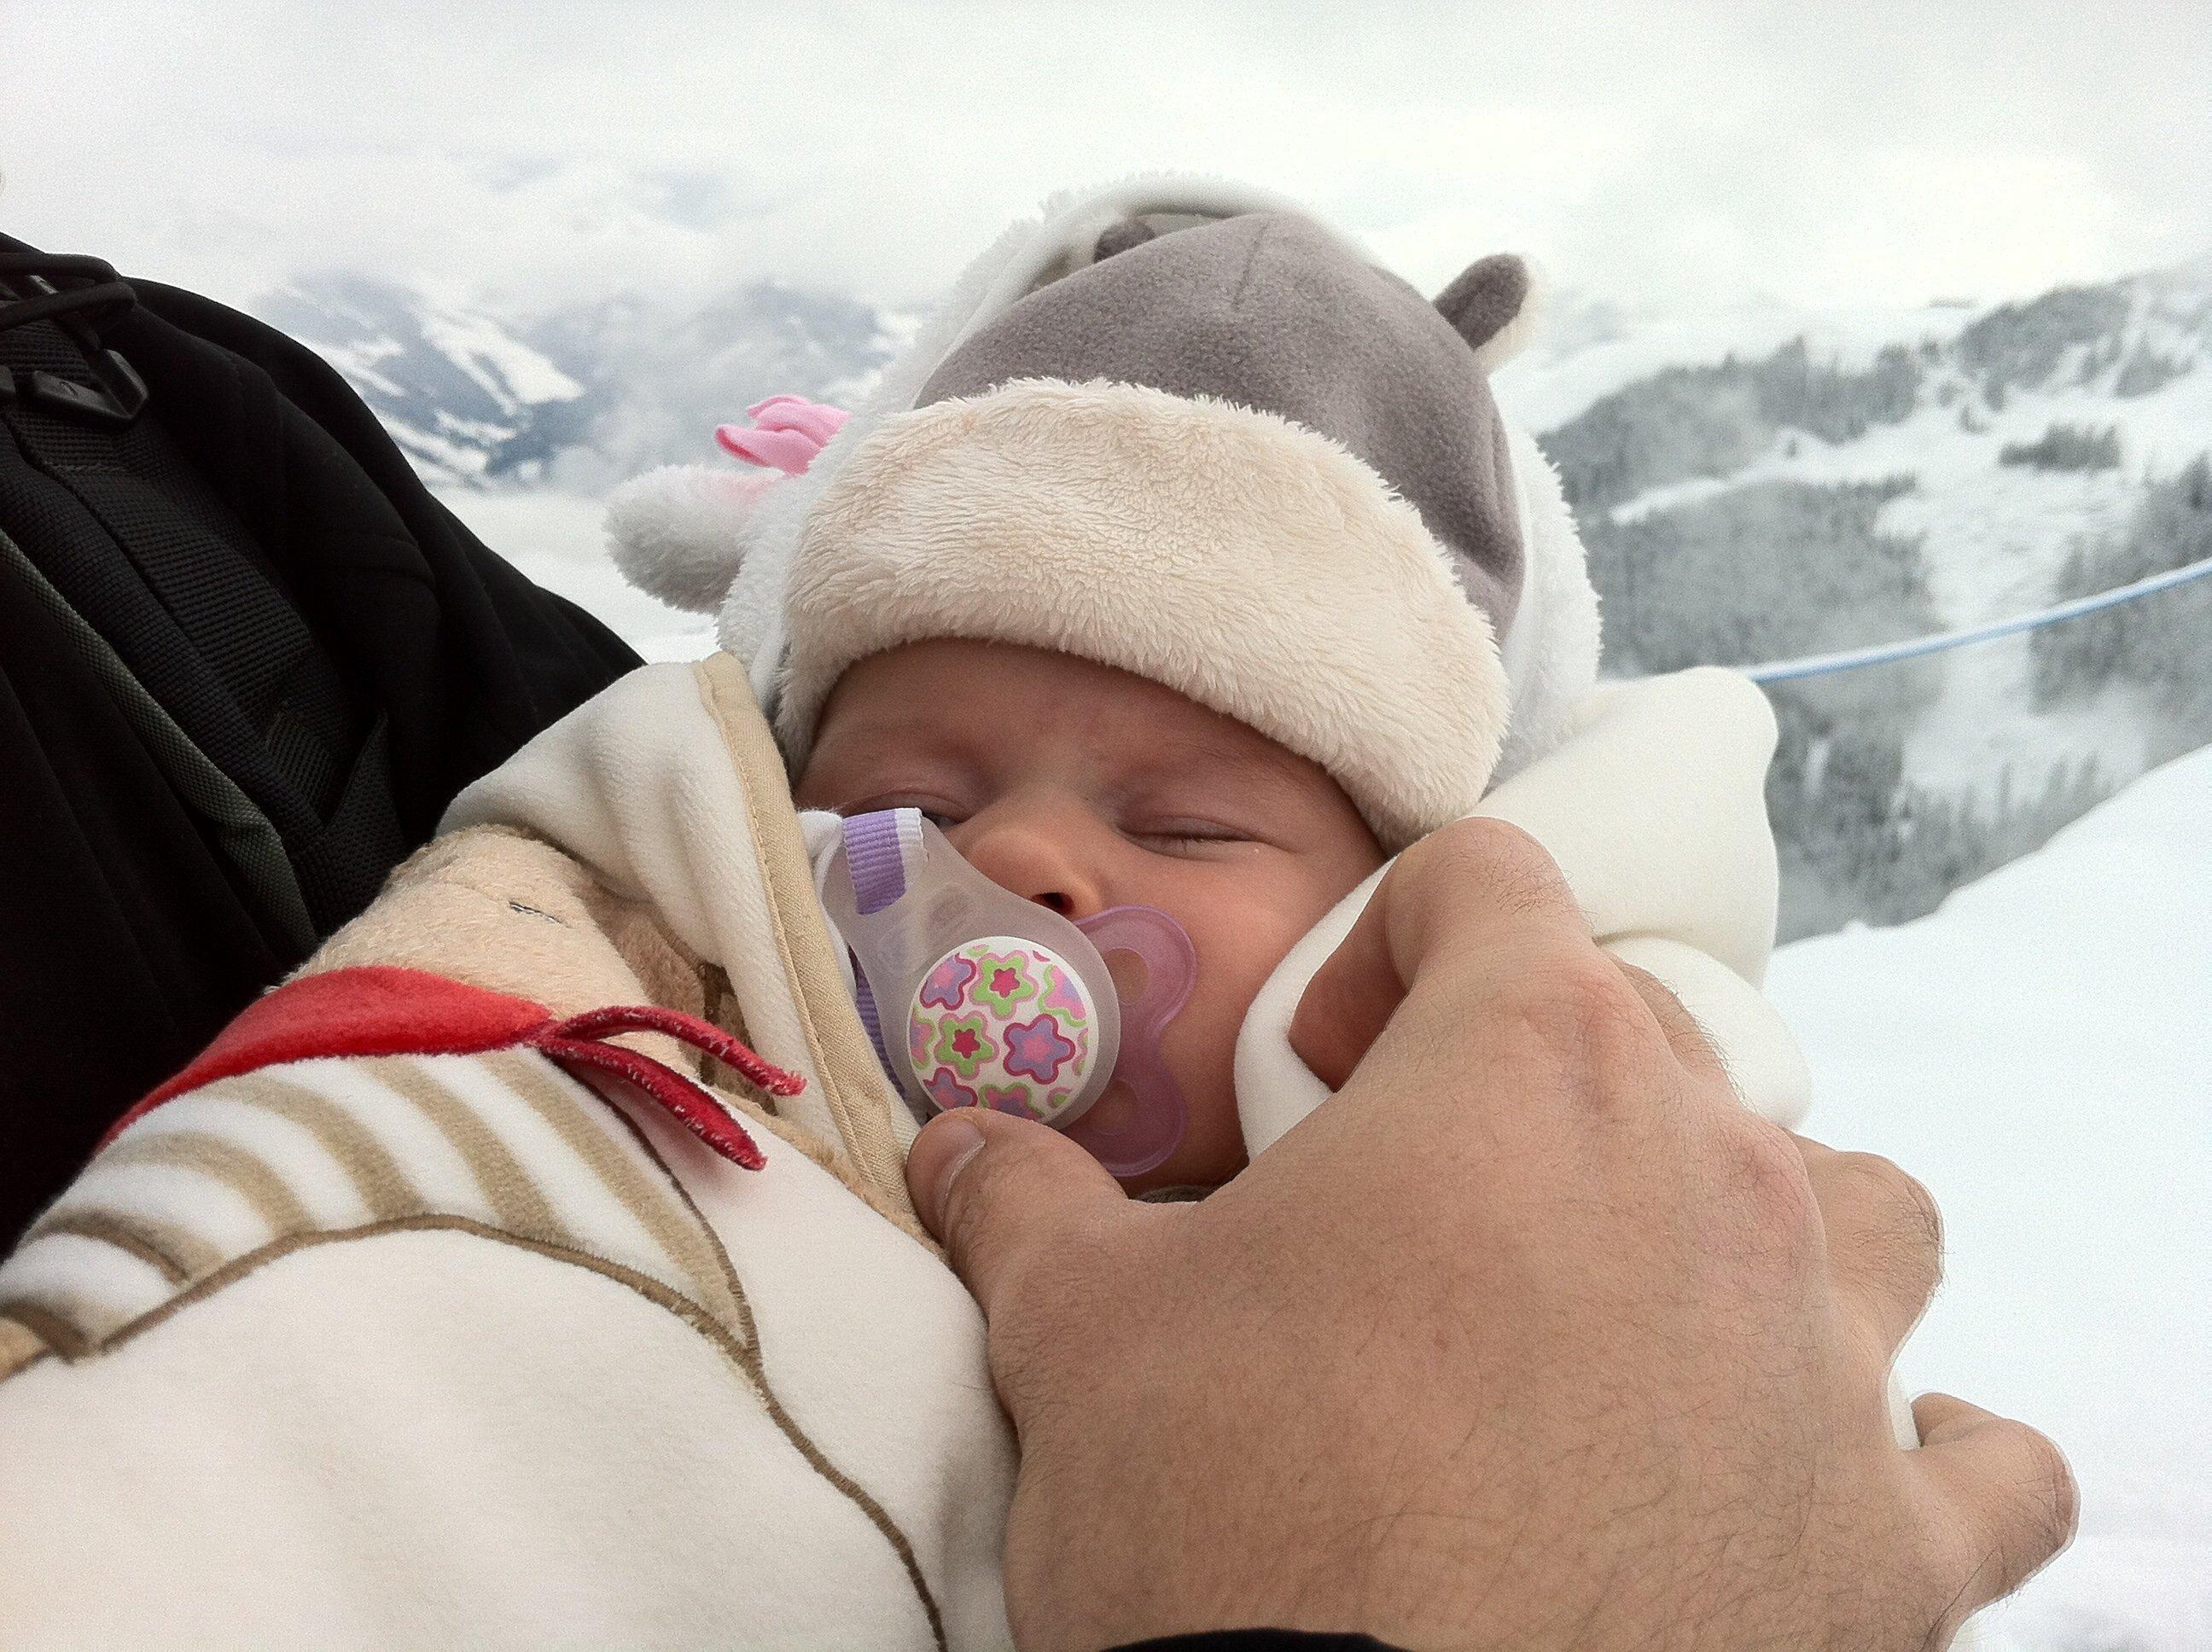 Maries erster Urlaub © BambiniTestblog